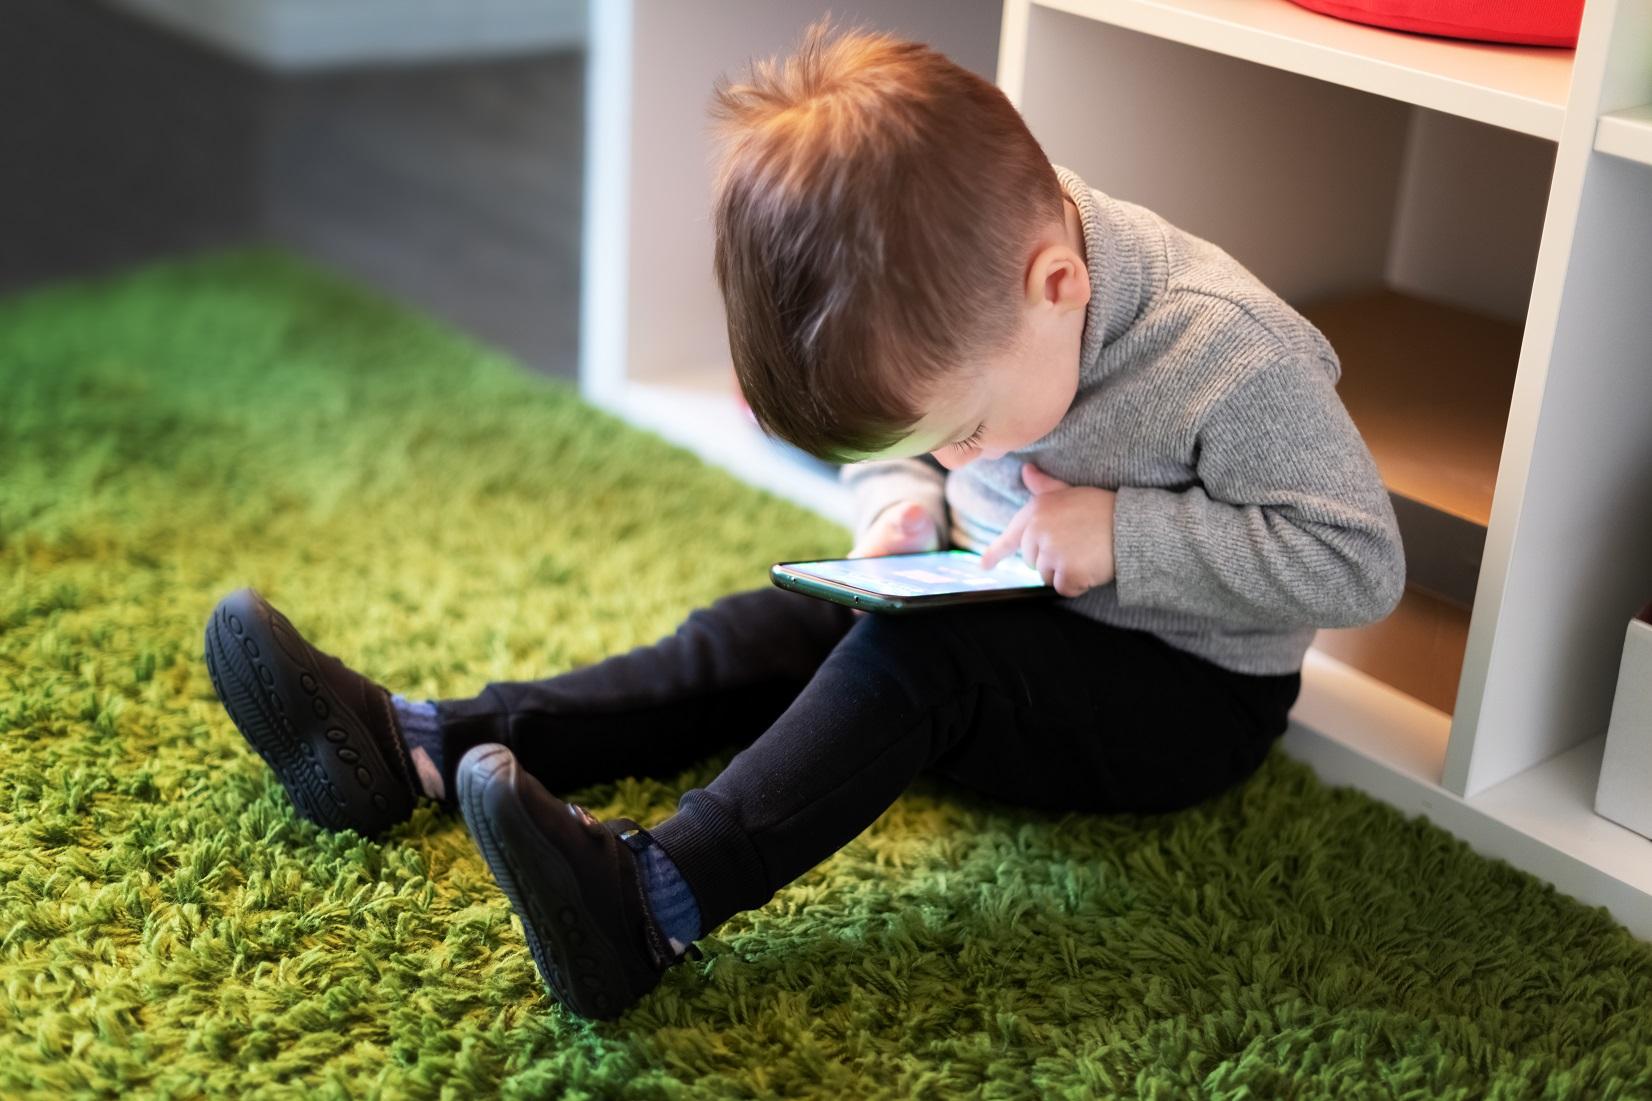 little boy play games on smartphone B9UACT7 Другая SOVA дети, психология